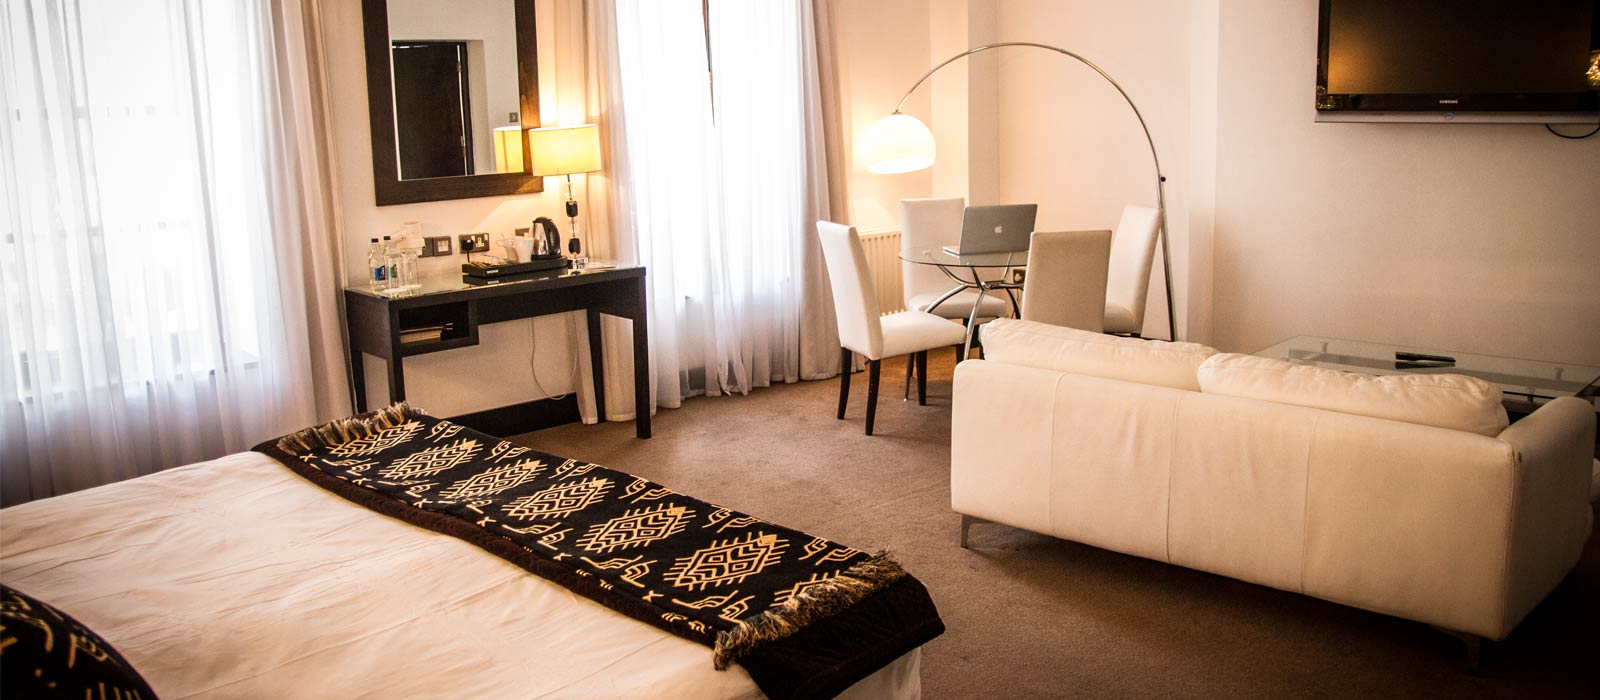 Zuni restaurant boutique hotel kilkenny city centre for Award winning boutique hotel